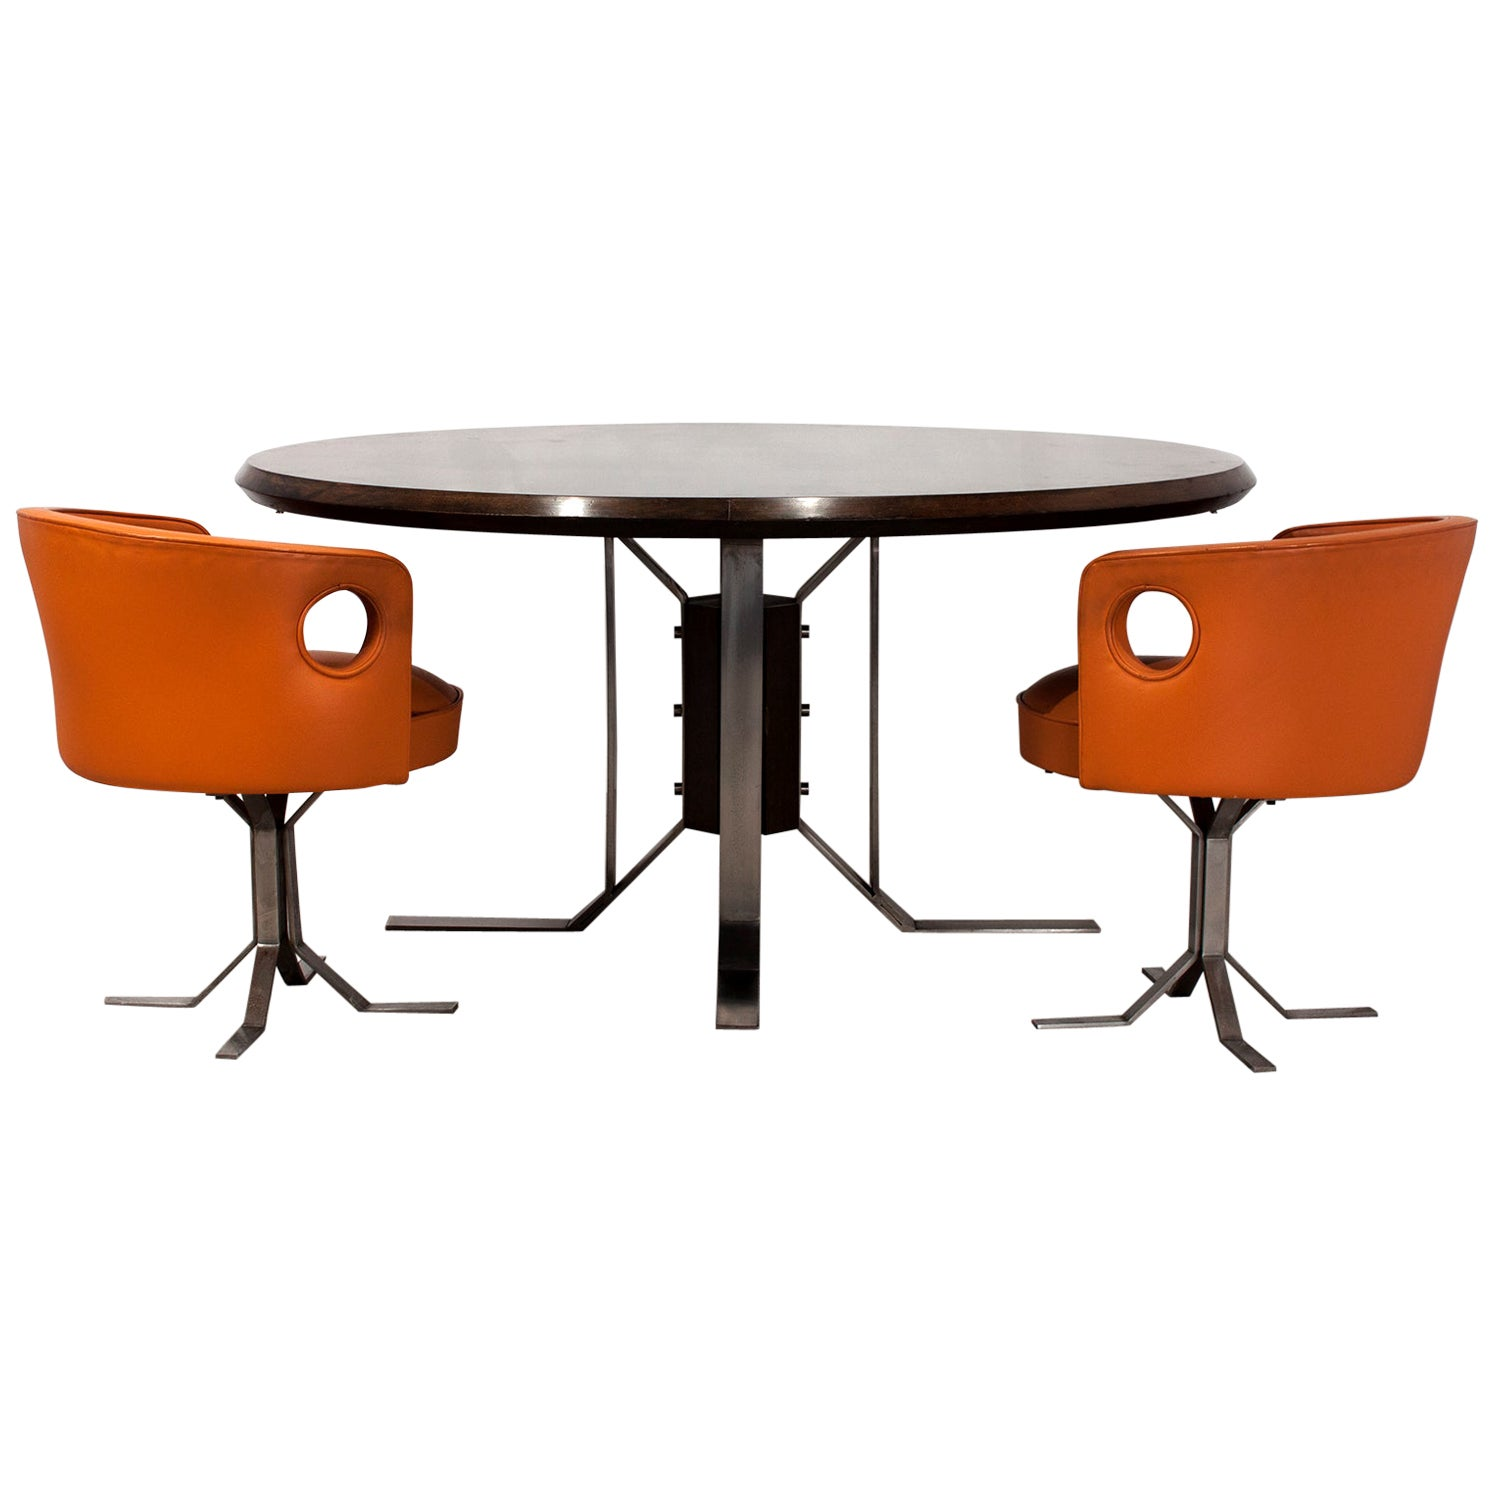 Jordi Vilanova Midcentury Walnut and Nickel-Plated Feet Round Dining Table 1970s